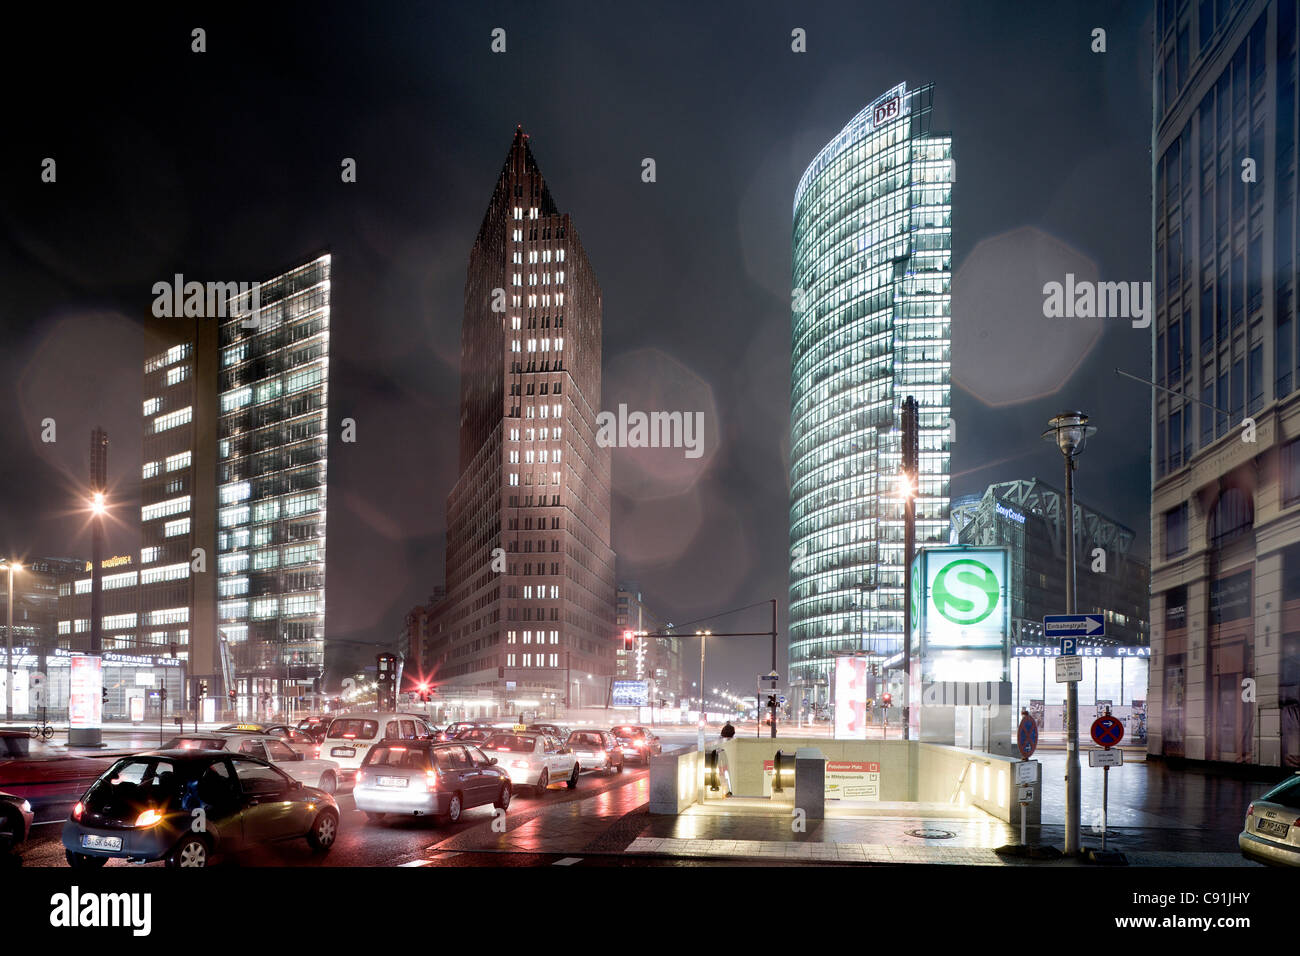 Potsdamer Platz, from left to right, Renzo Piano Tower, Hans Kollhoff Tower, Bahn Tower, Berlin-Mitte, Berlin, Germany, - Stock Image